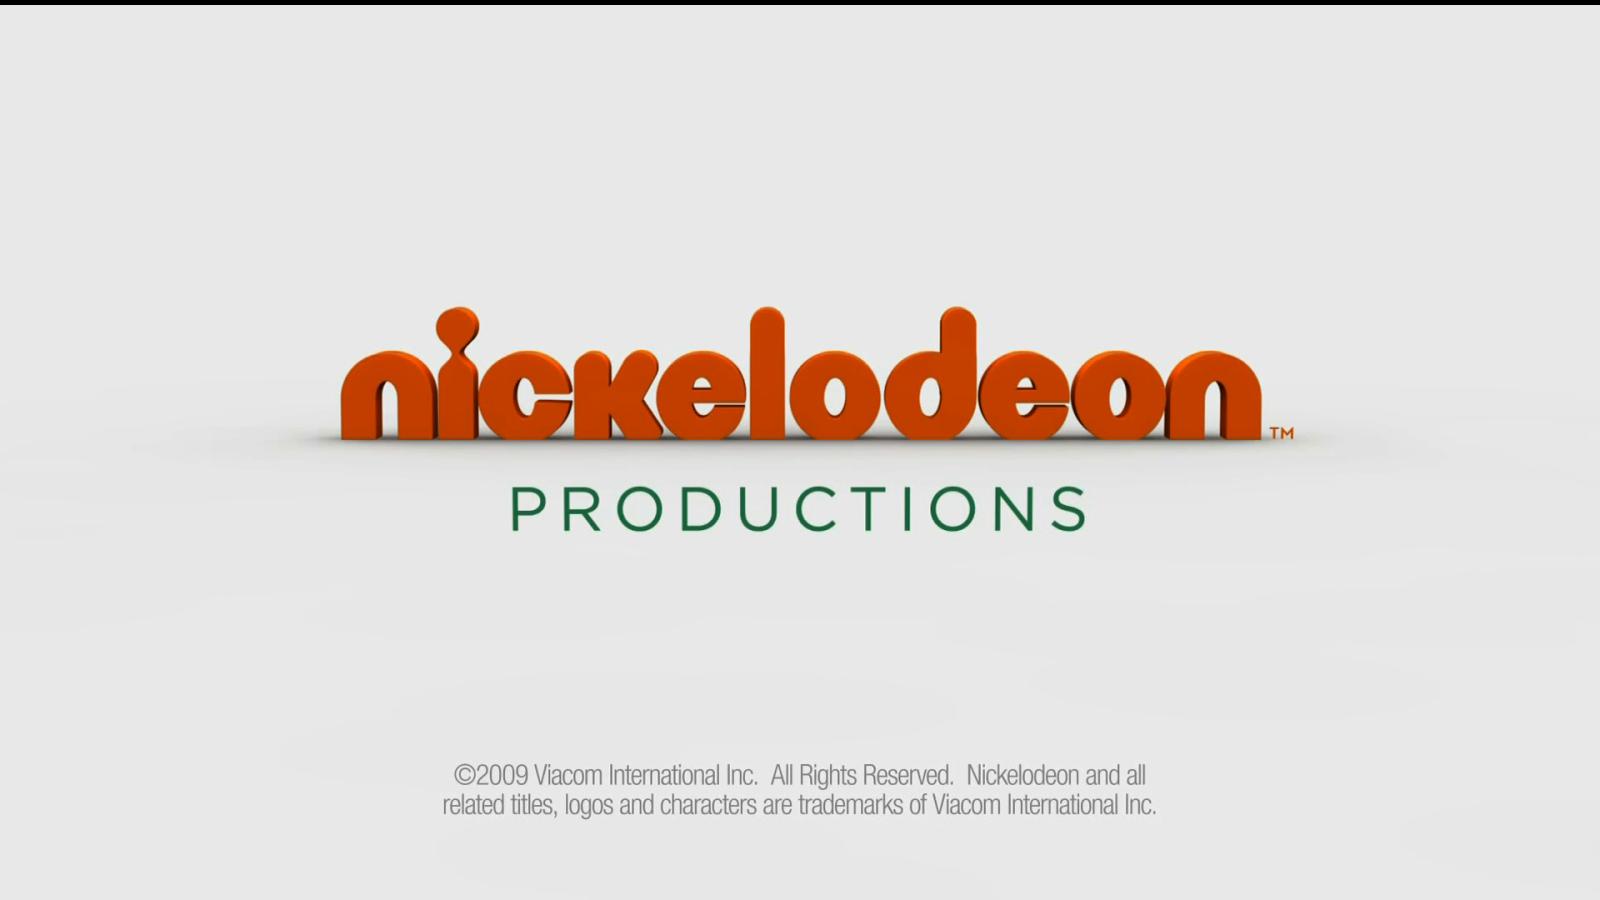 Nick Jr Productions Logo Nickelodeon productions logo